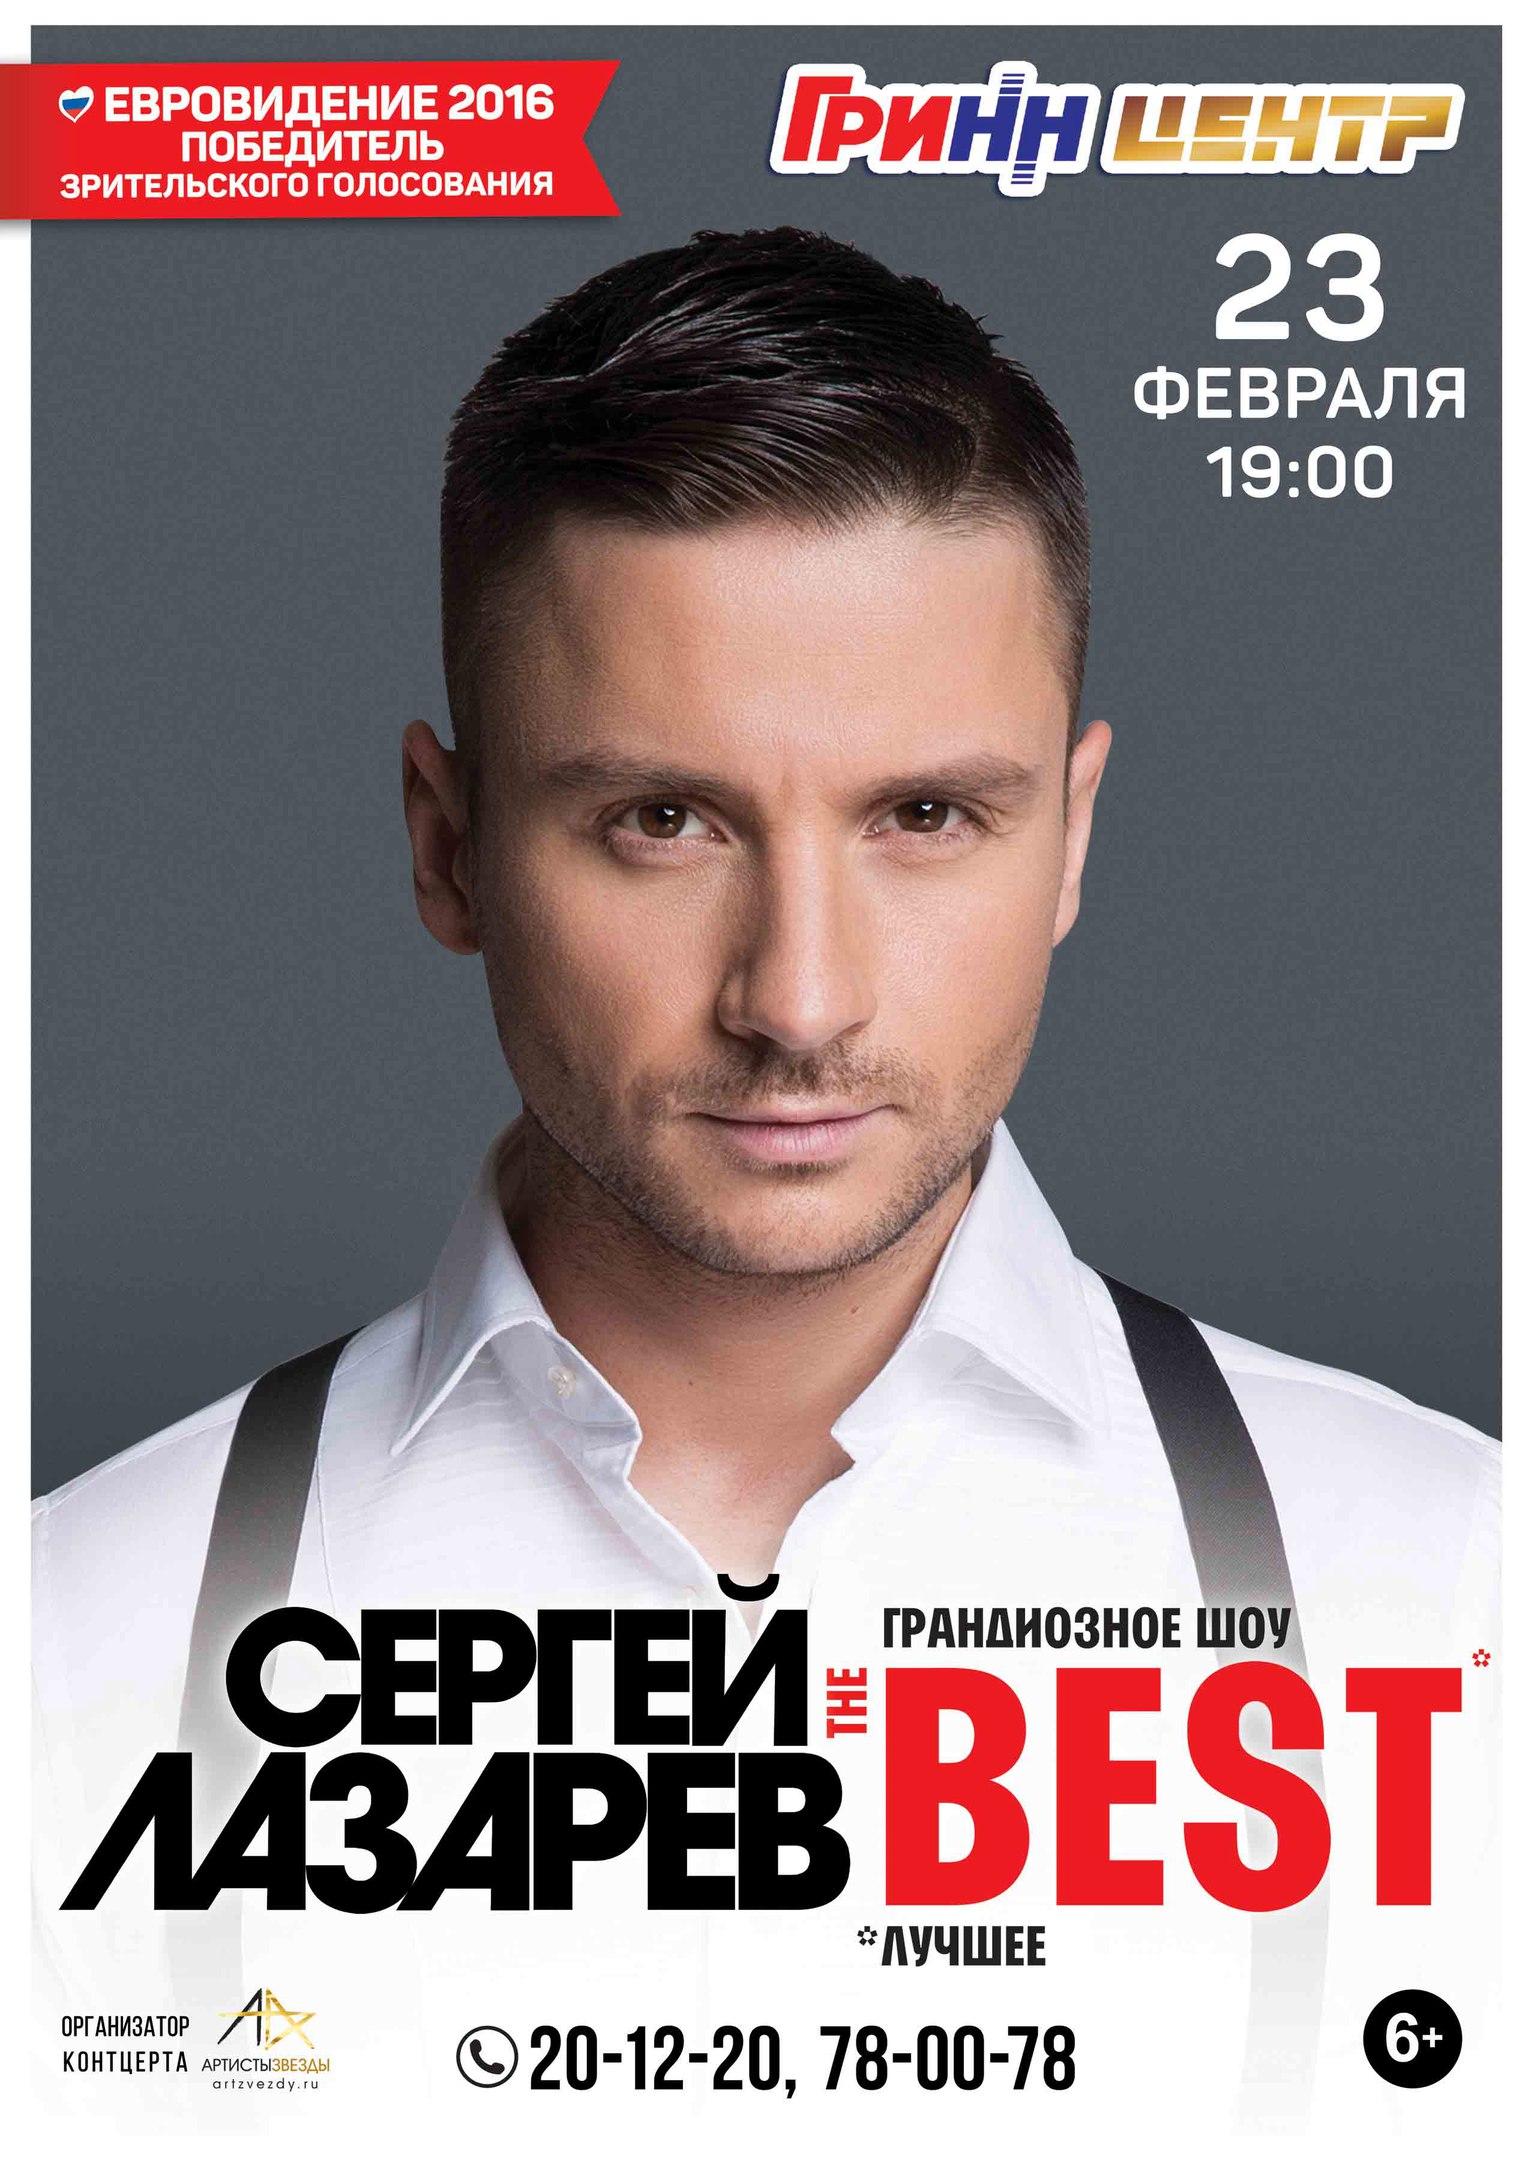 Сергей Лазарев «The Best»